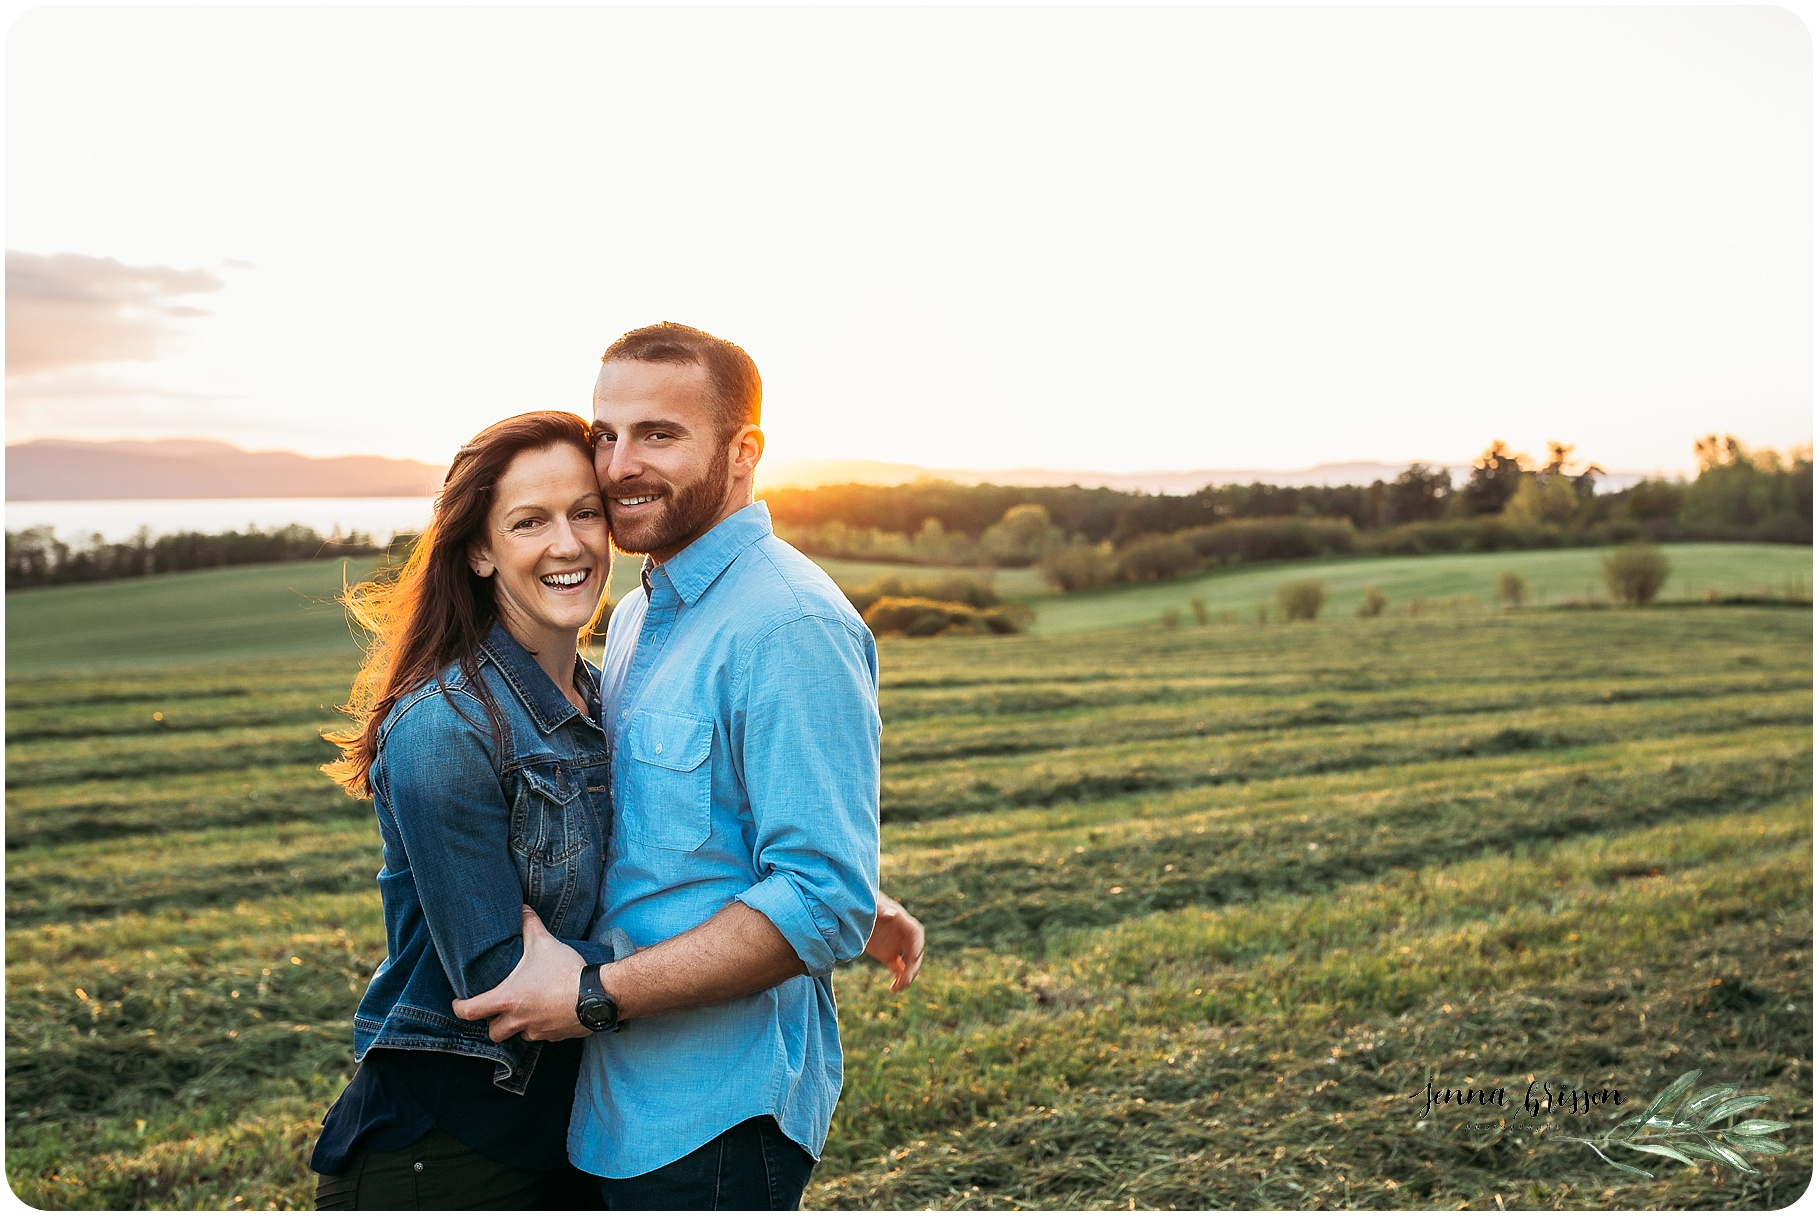 Shelburne Farms Engagement 7 - Jenna Brisson Photography